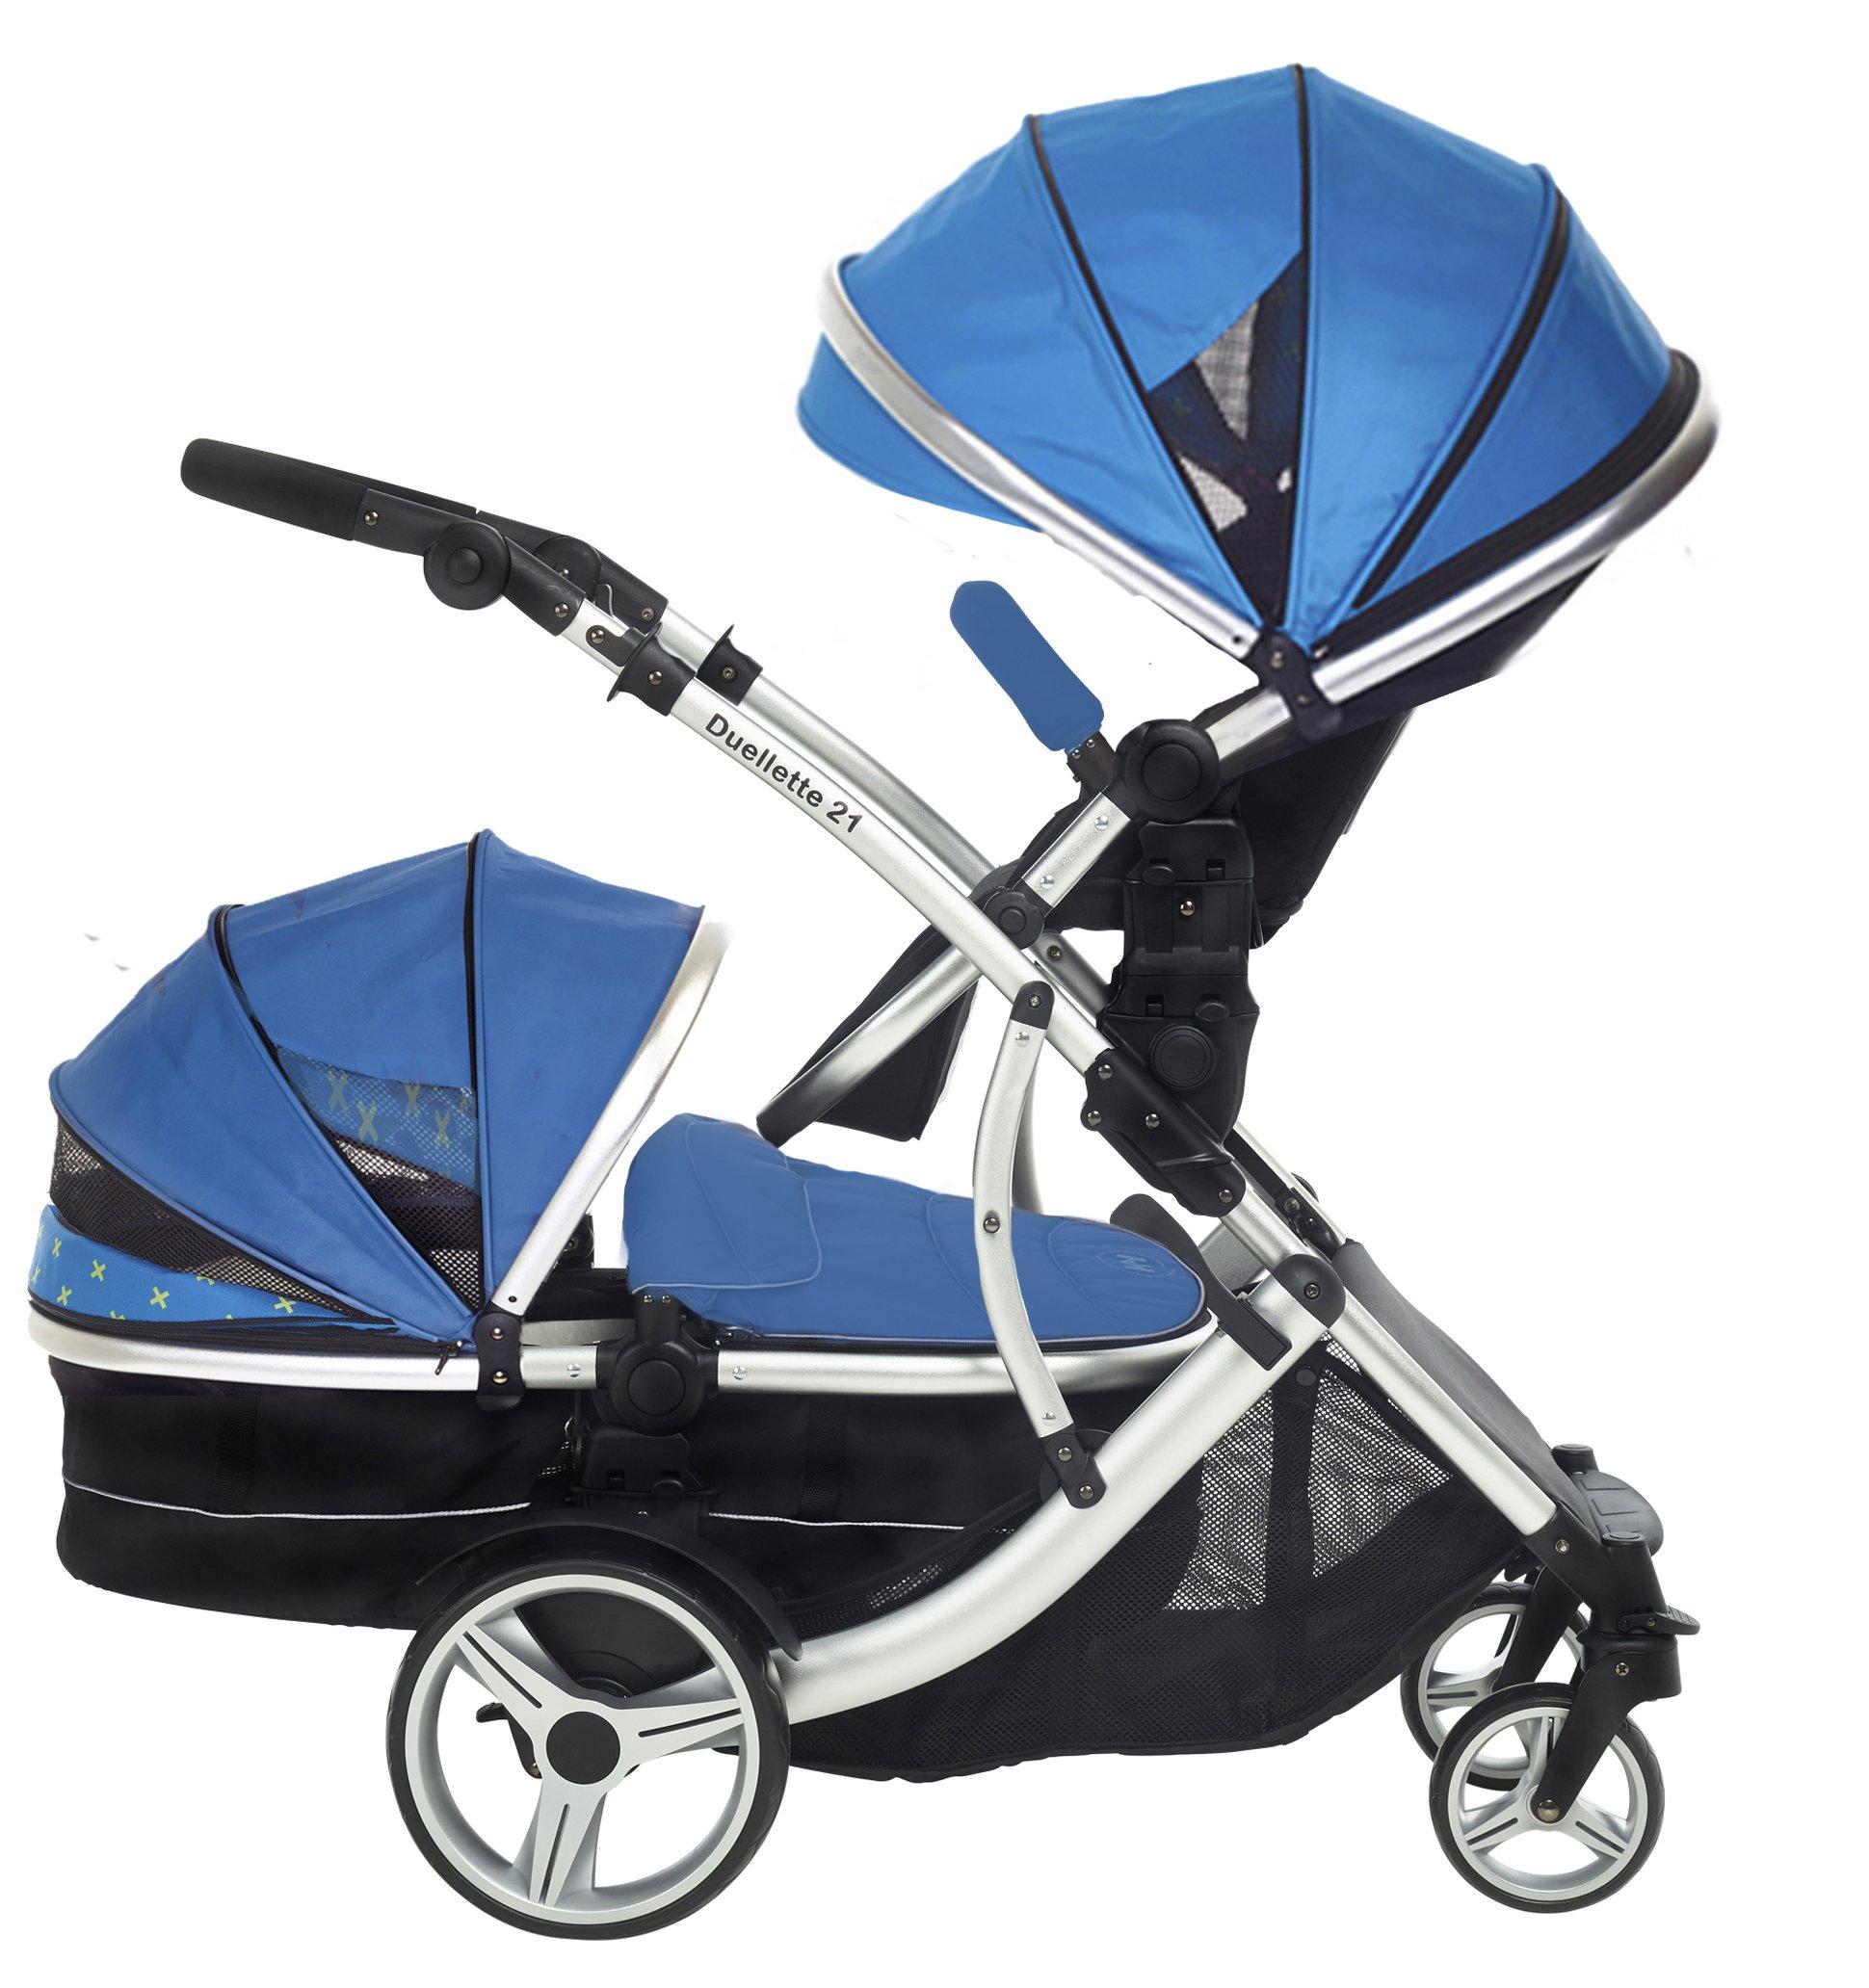 Duellette 21 BS Combo Double Twin Pushchair Baby Newborn carrycots Pram Travel system Tandem stroller buggy: 1 Pramette/seat unit for newborn baby, 1 seat unit for toddler 2 footmuffs 2 Rain covers, Teal Mist by Kids Kargo  kids kargo